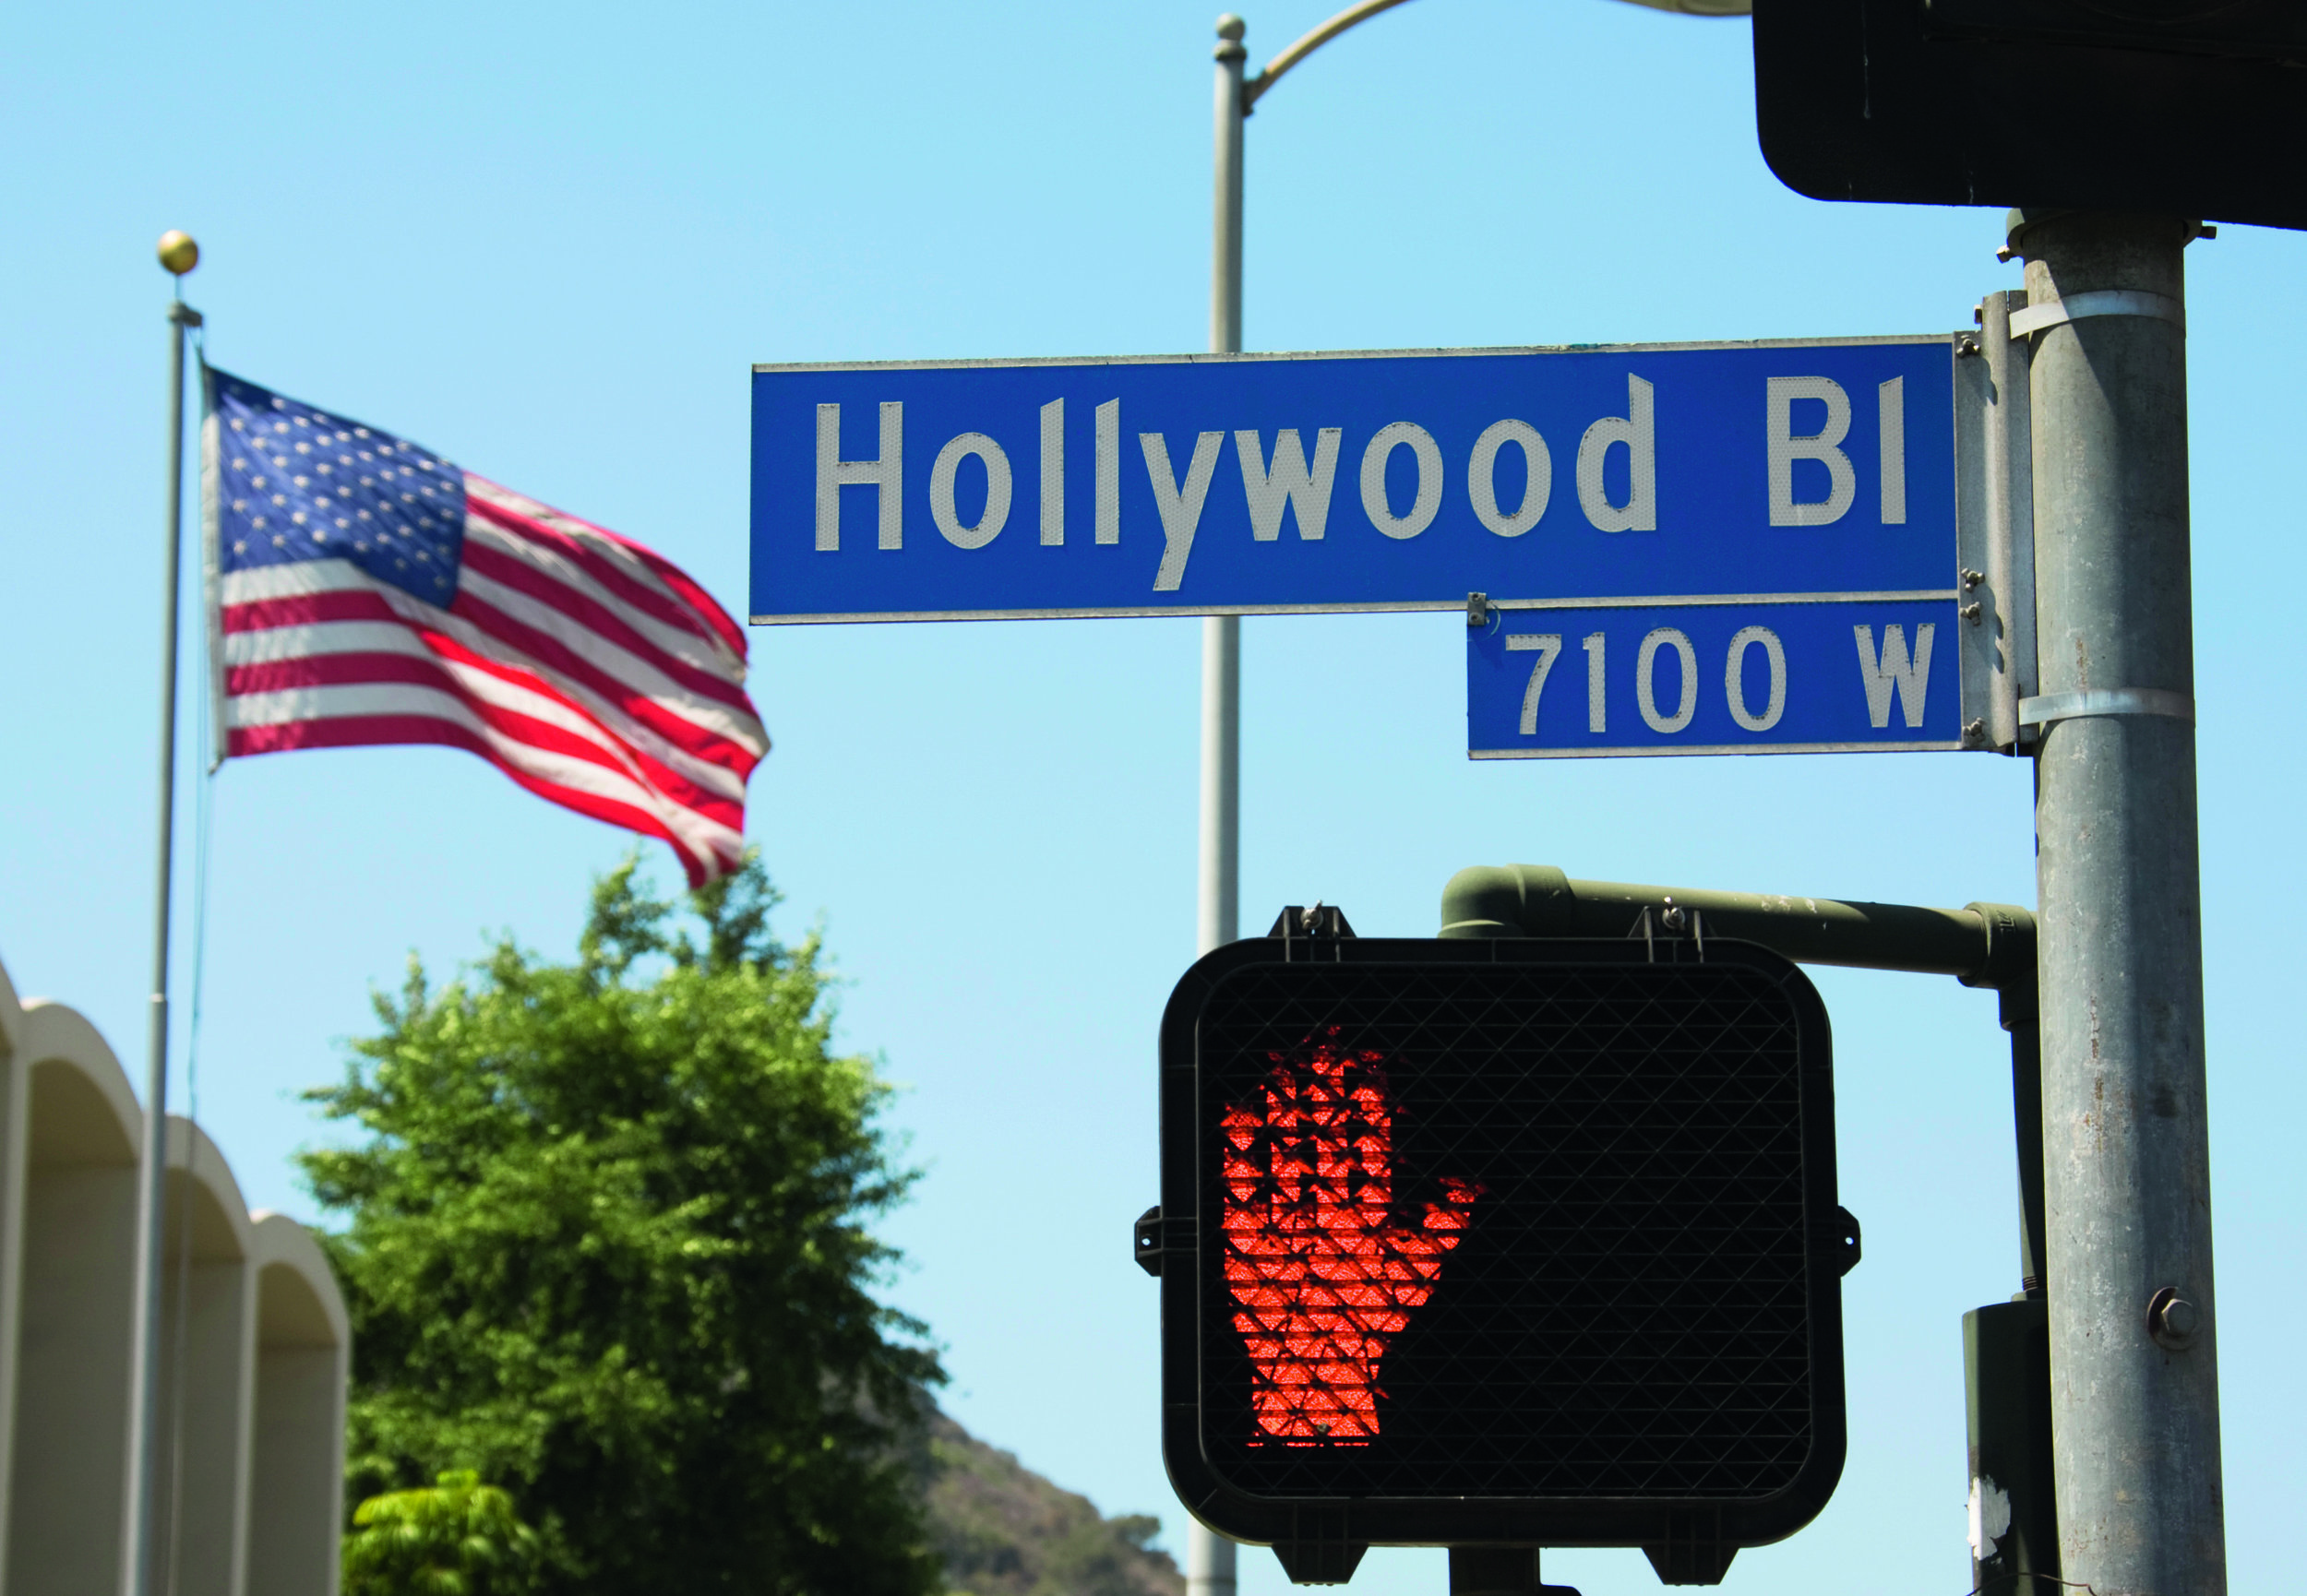 Hollywood BL Los Angeles